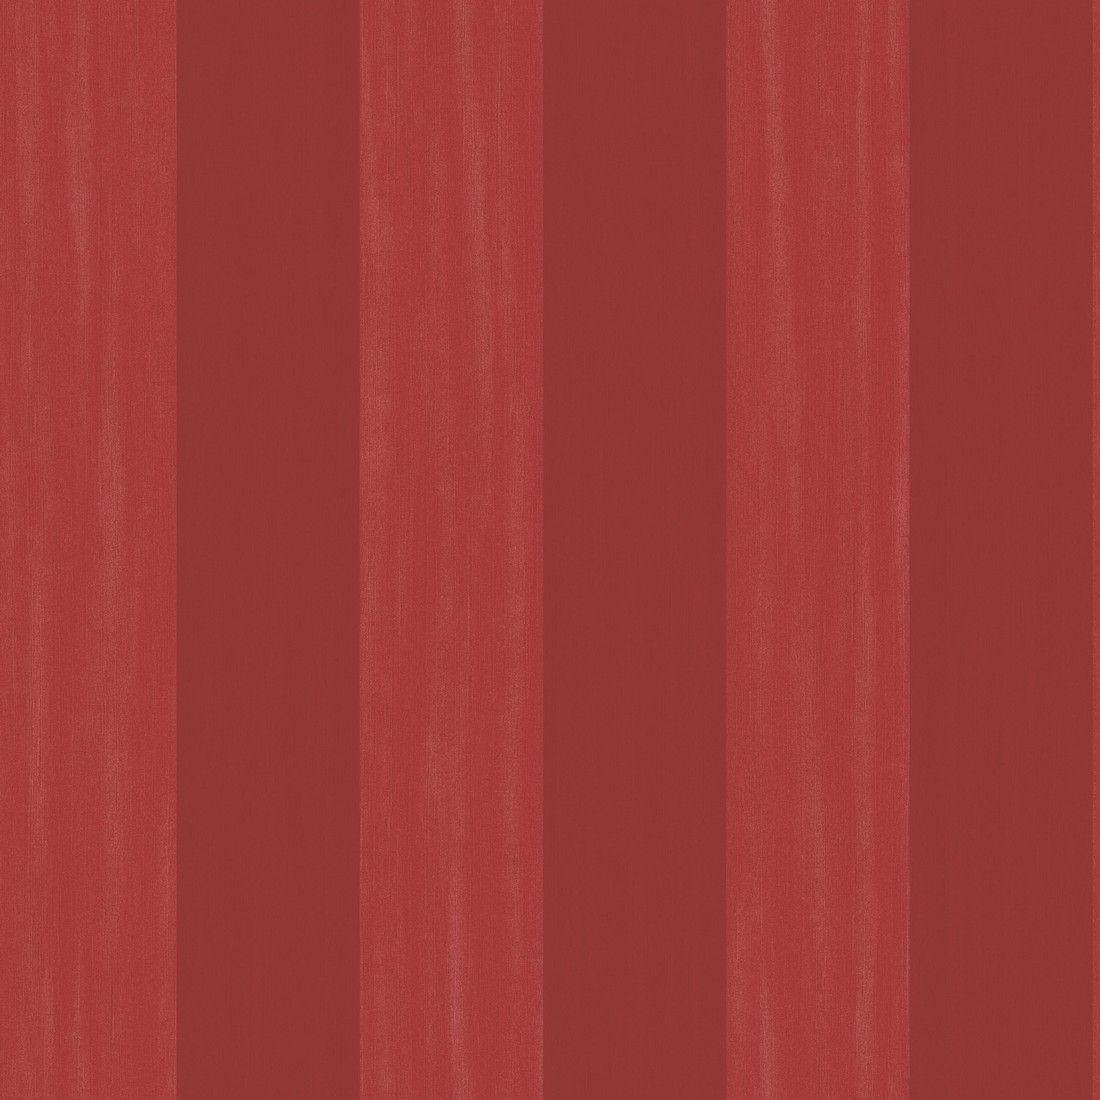 Papel pintado rayas vin lico ambassade amba81318101 for Rollo papel vinilico